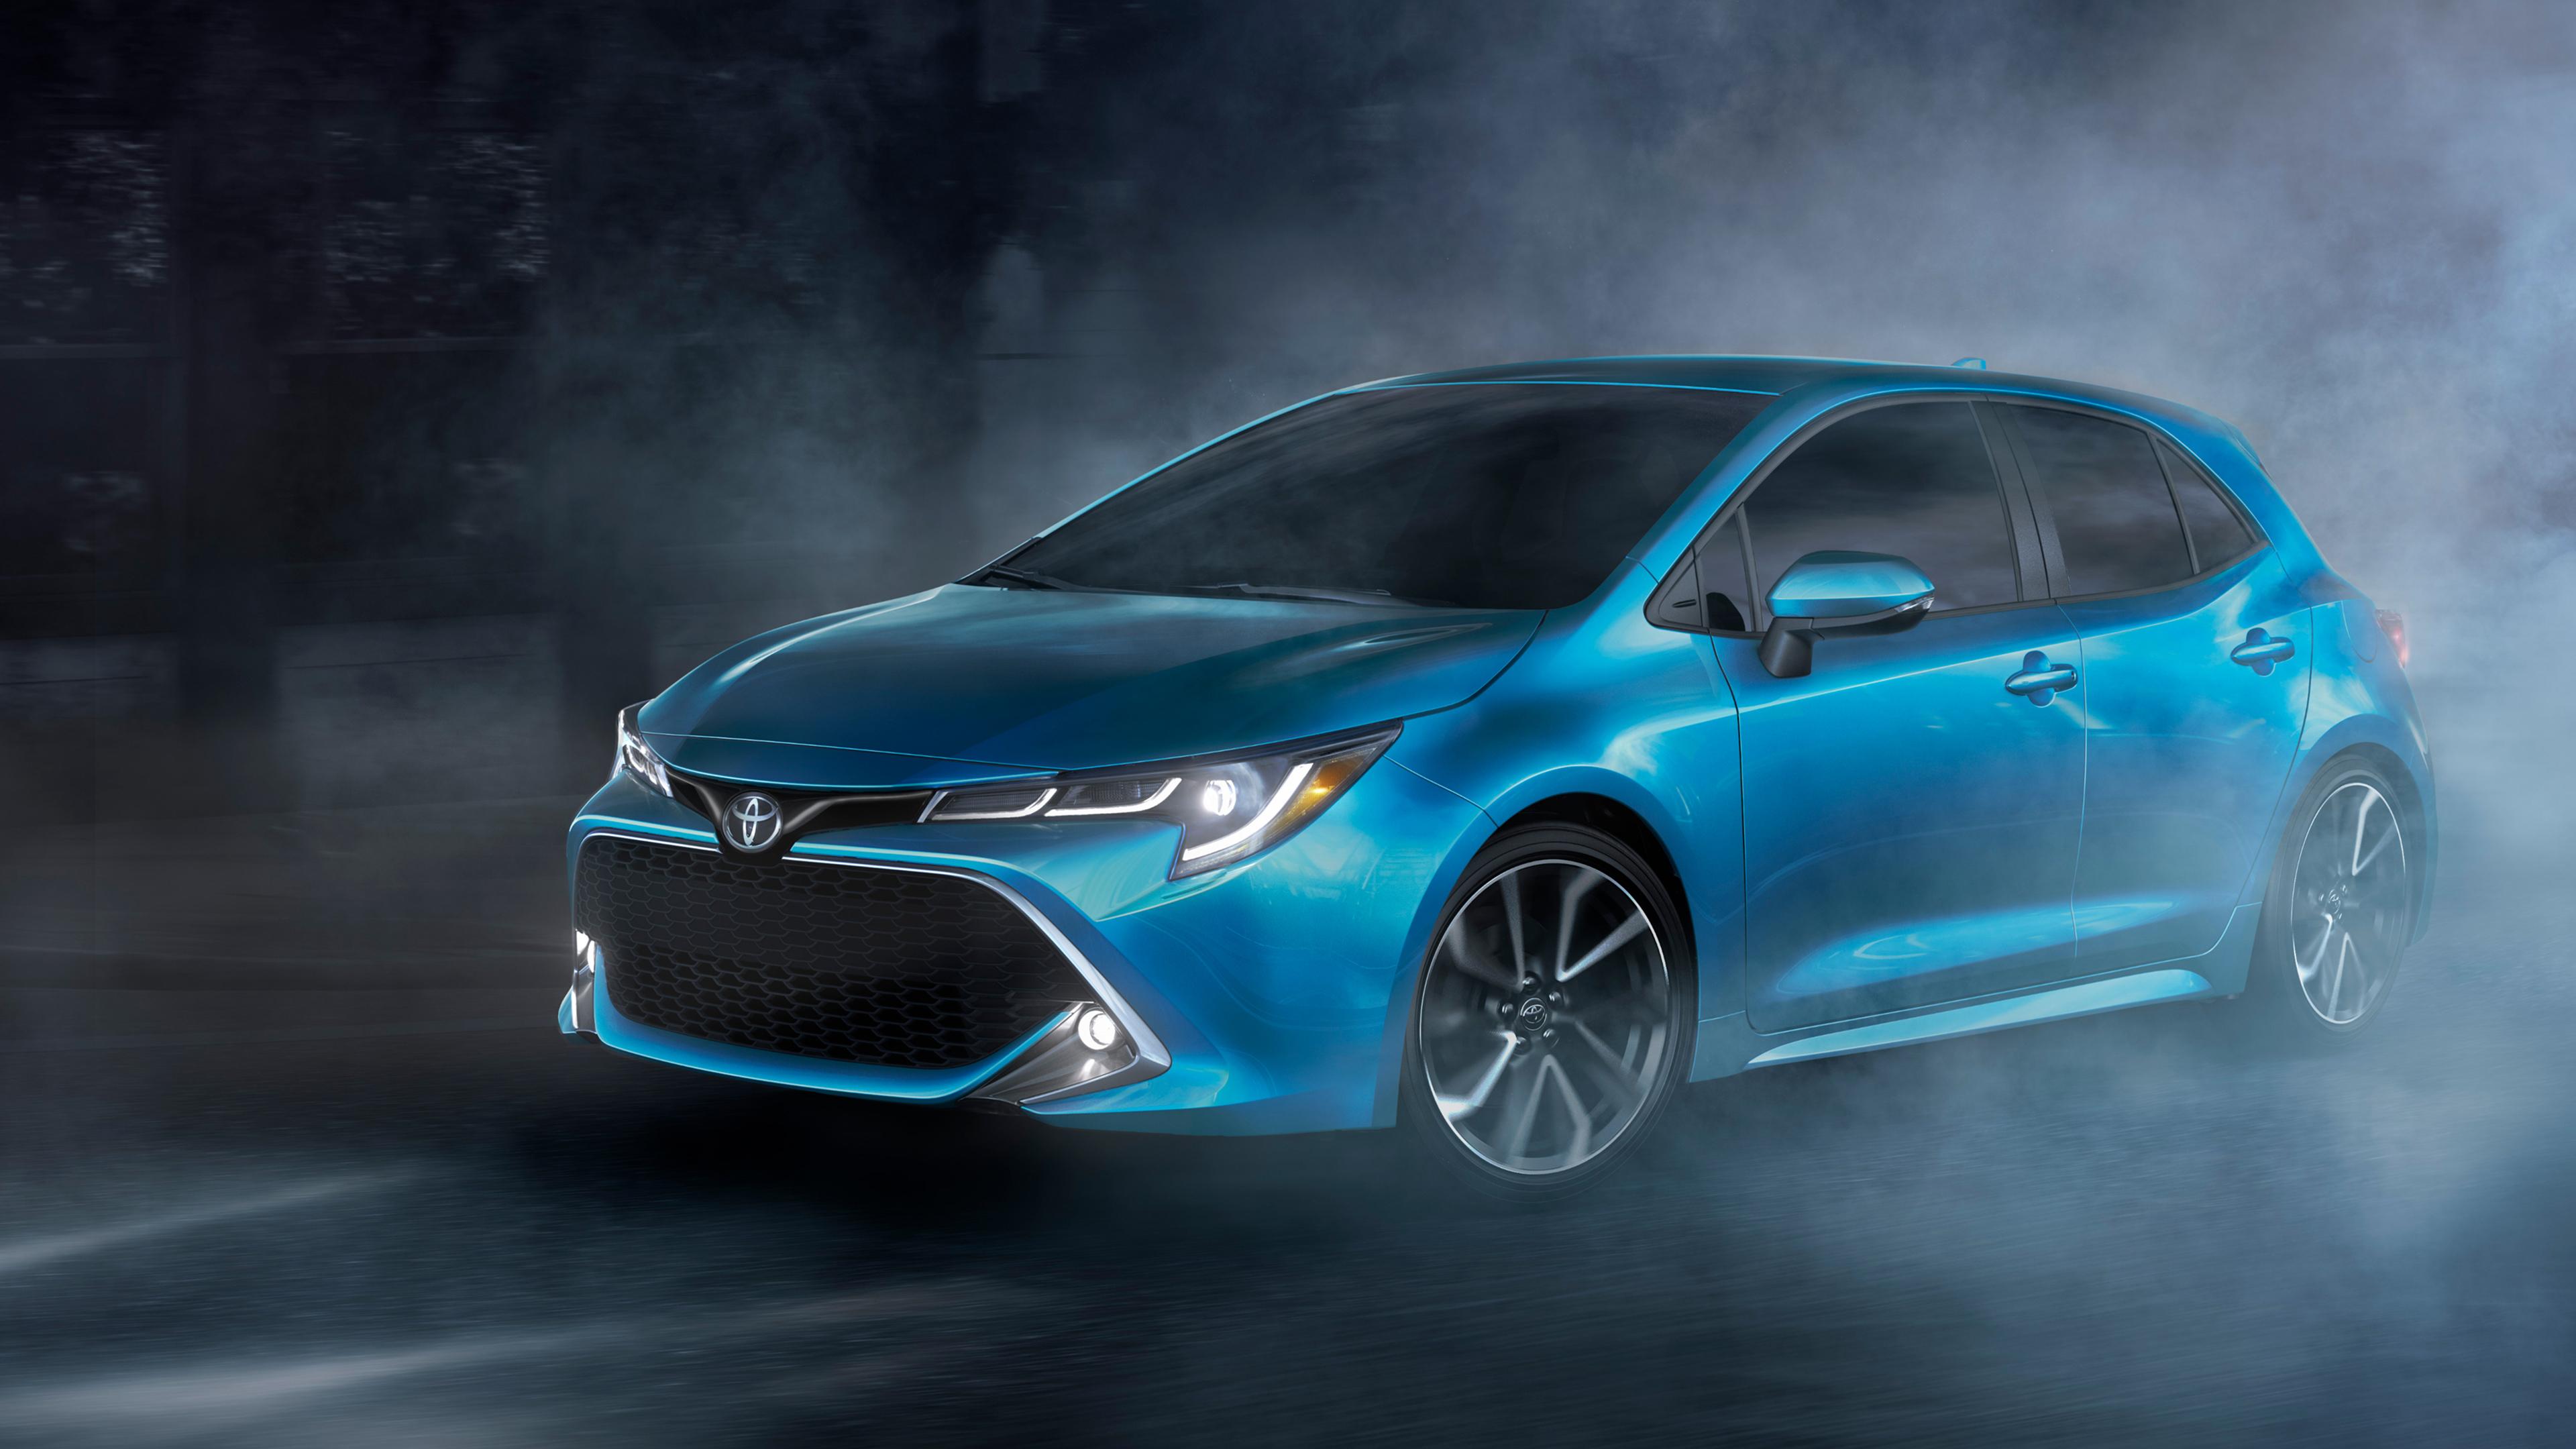 toyota yaris ia trd all new vellfire price 2019 corolla xse hatchback 4k wallpaper | hd car ...